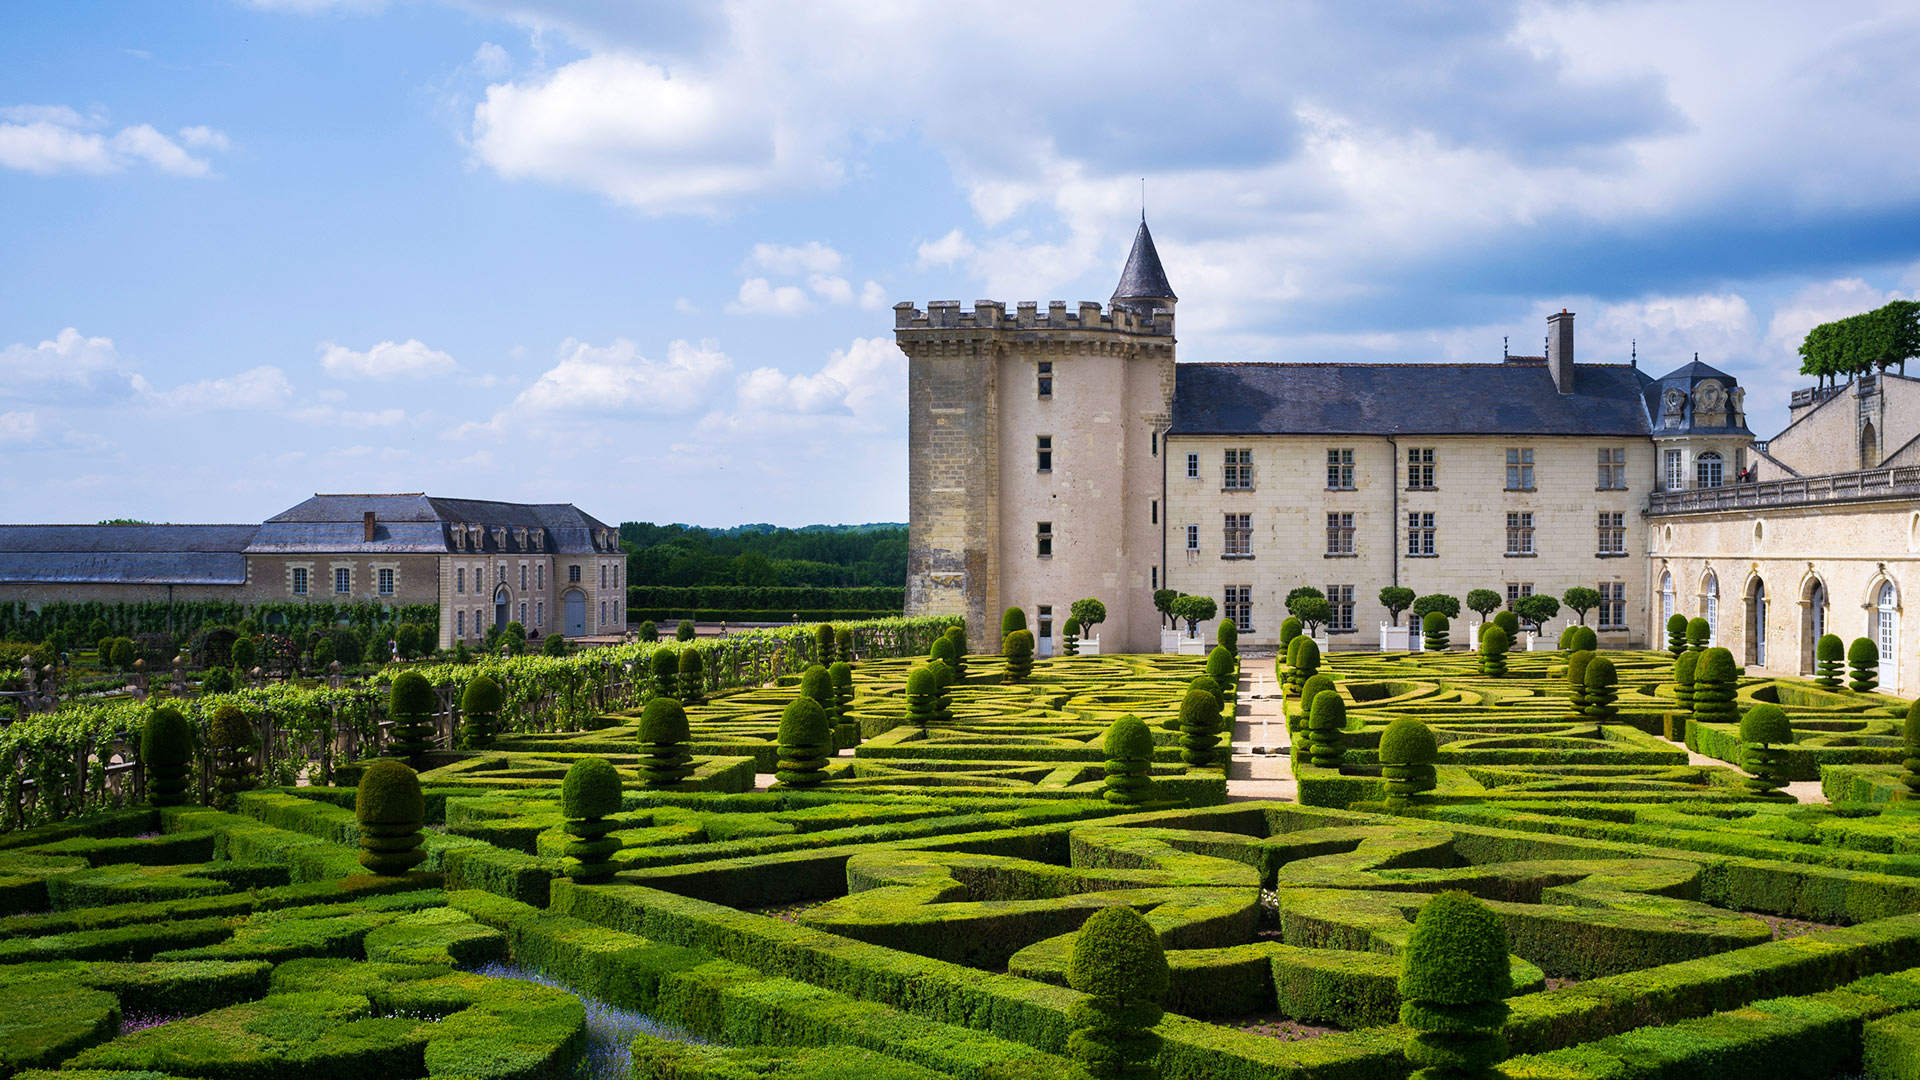 Viaje cultural a los Castillos del Loira